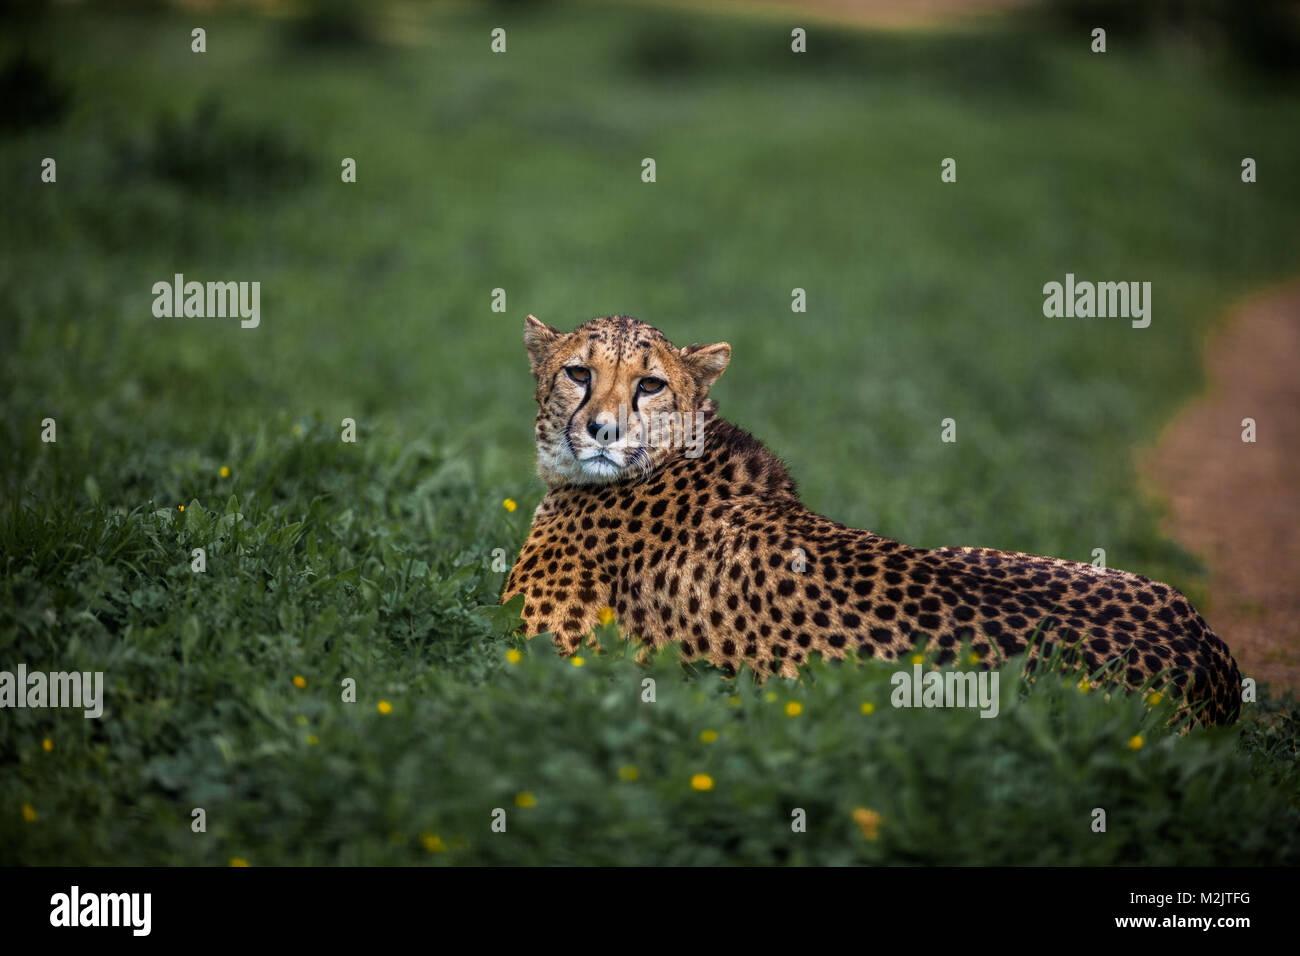 Beautiful Wild Cheetah resting on green fields, Close up - Stock Image